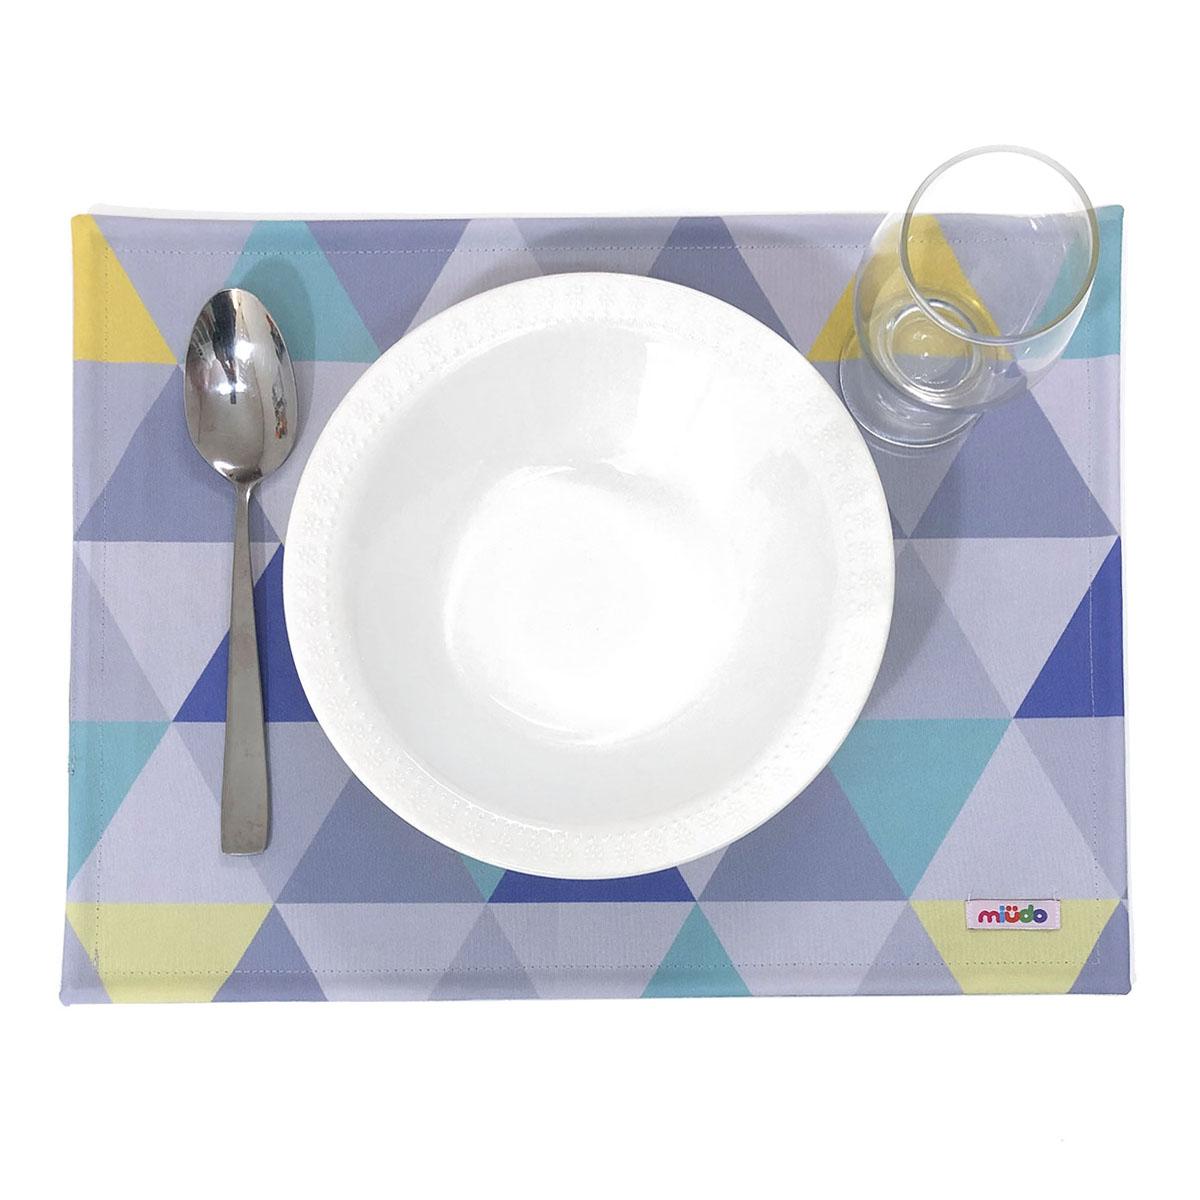 Jogo Americano Triângulos Cinza, Amarelo E Azul